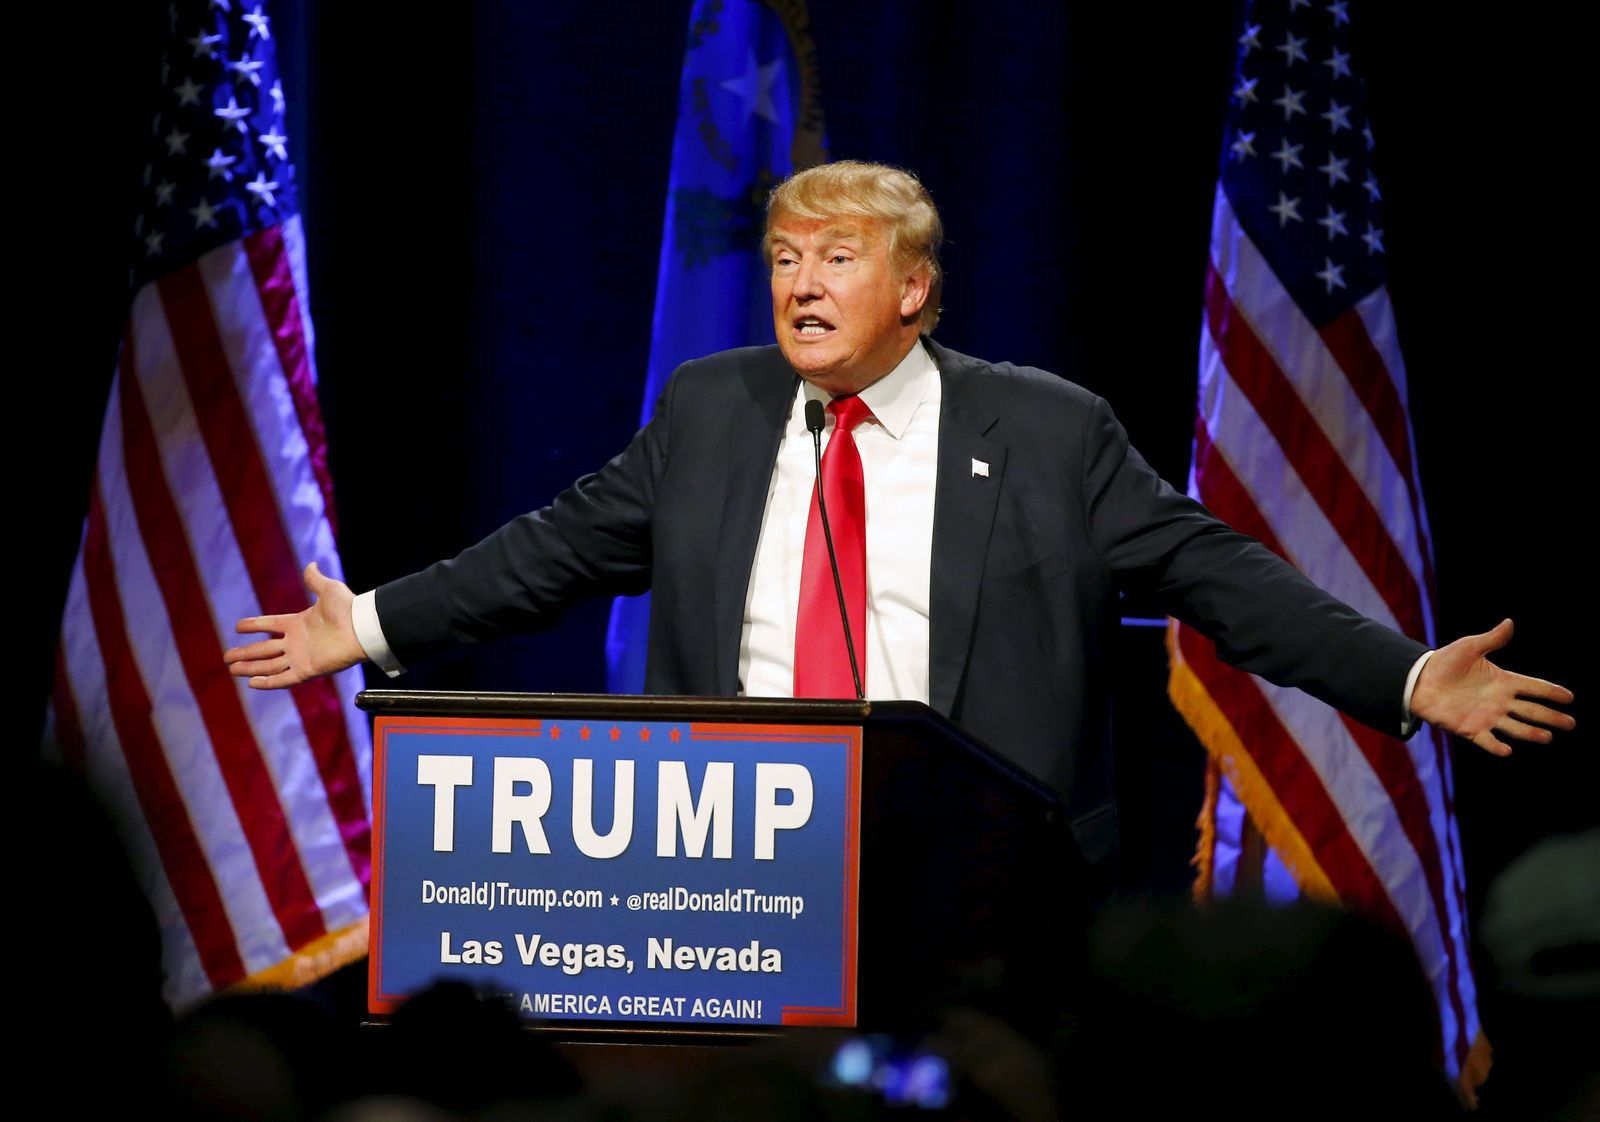 Donald Trump / Las Vegas